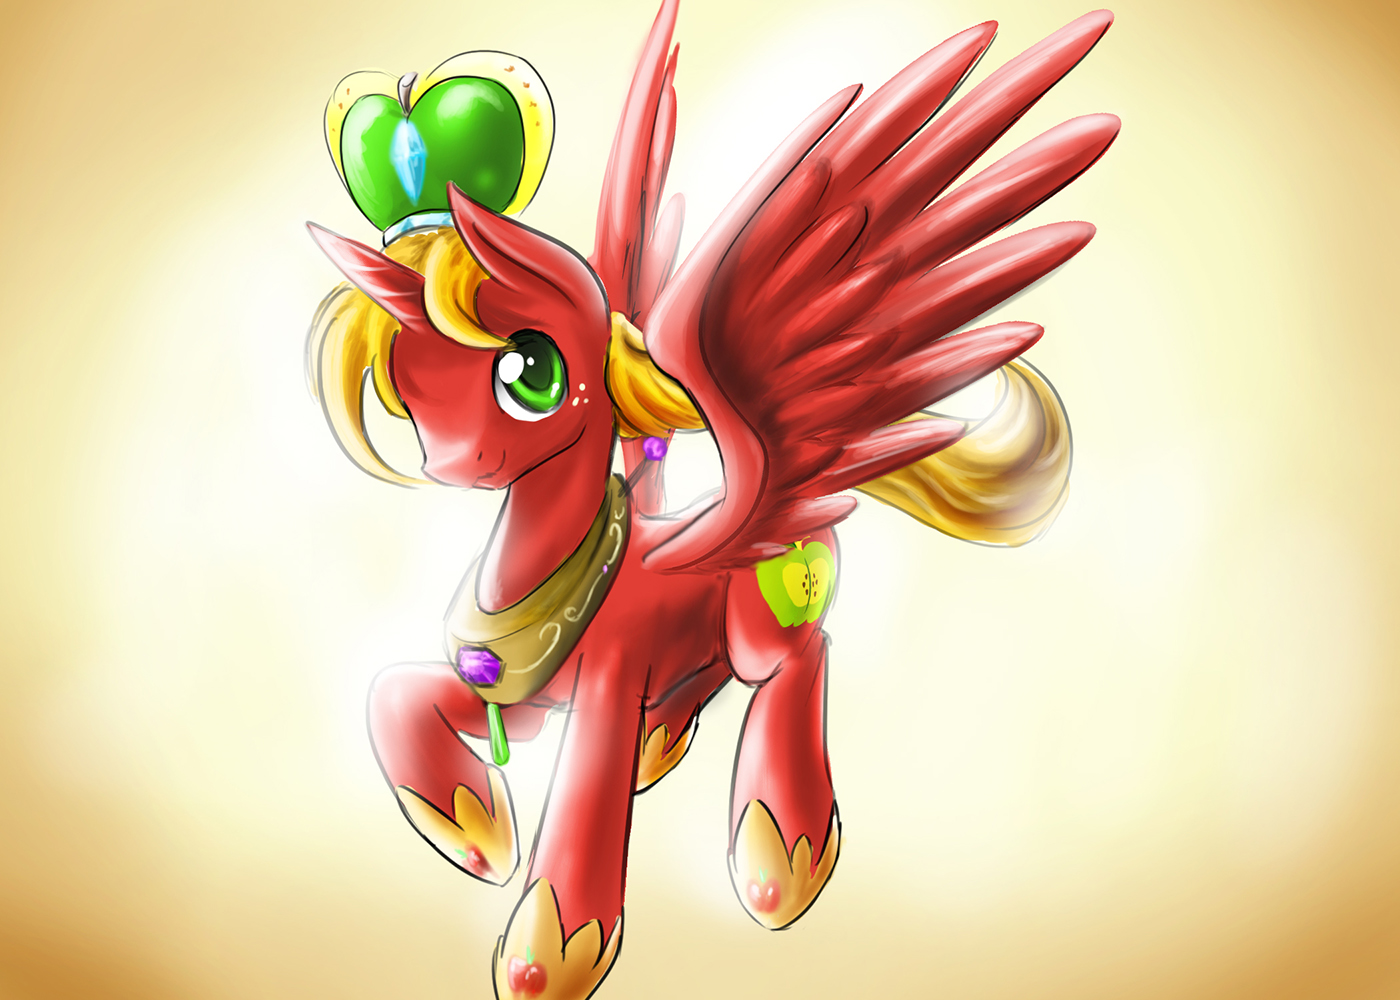 Princess Big Mac My Little Pony Friendship Is Magic Princess Big Macintosh